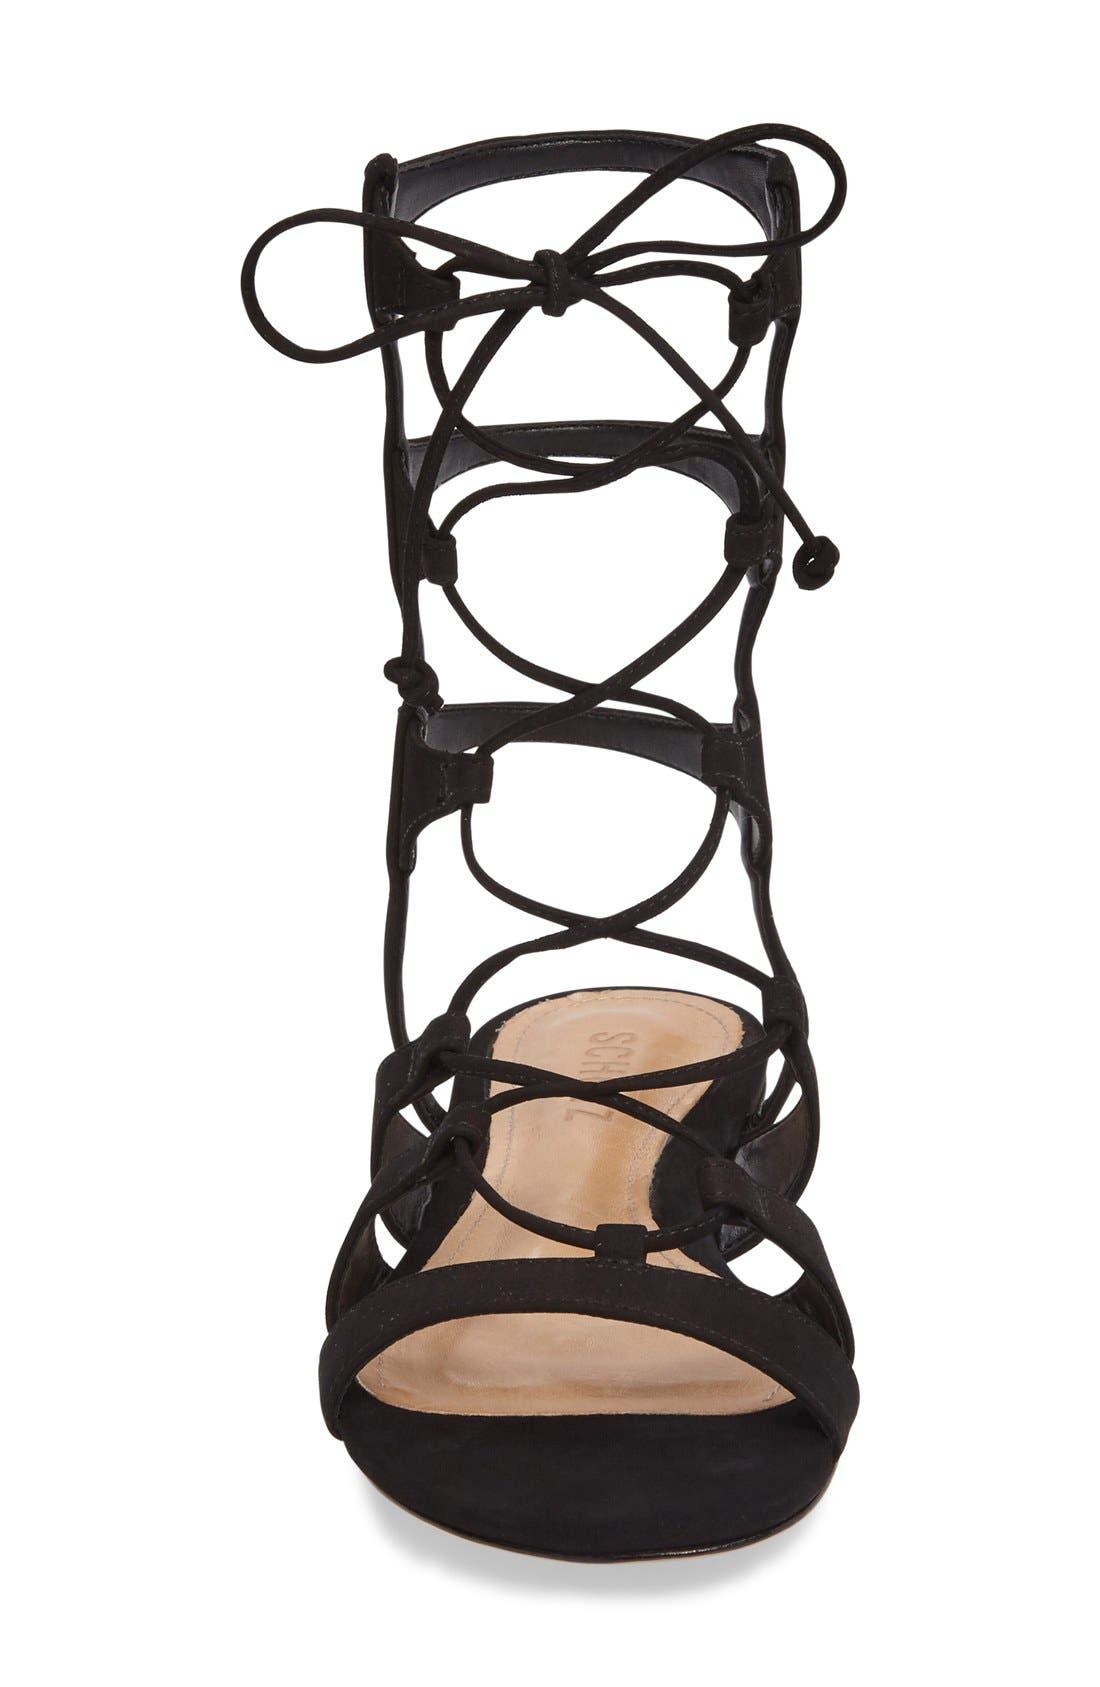 Erlina Lace-Up Sandal,                             Alternate thumbnail 4, color,                             004